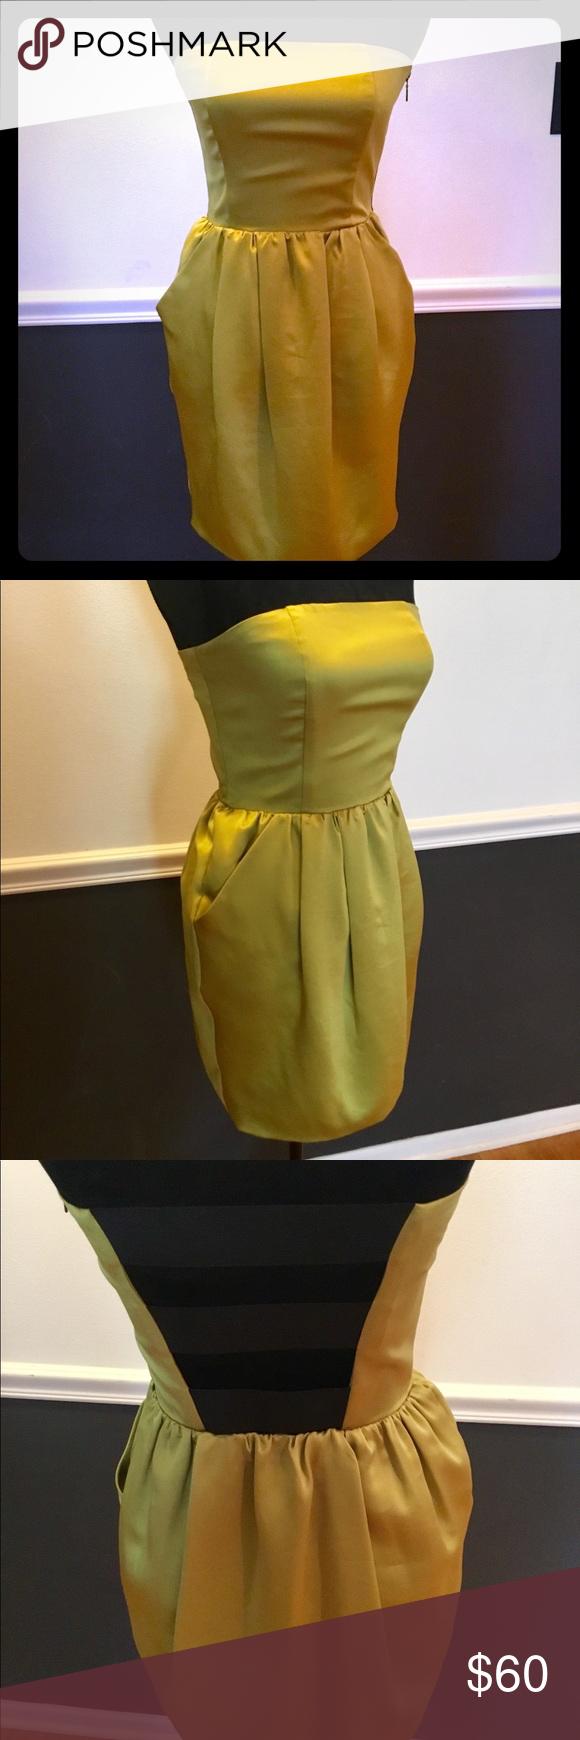 Nwt Rachel Roy Lime Green Black Strapless Dress Black Strapless Dress Strapless Dress Rachel Roy [ 1740 x 580 Pixel ]